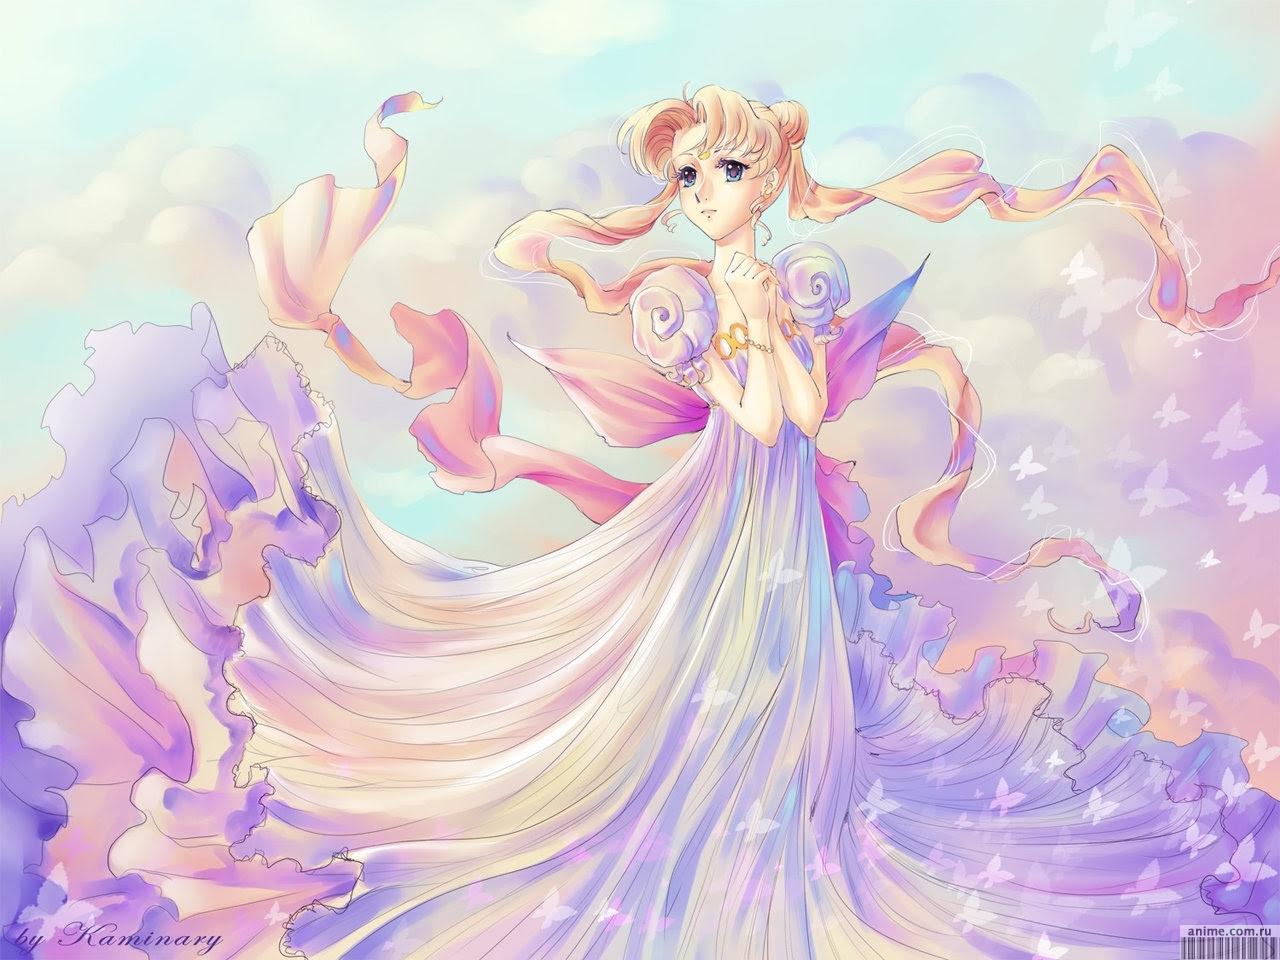 Unduh 5000 Koleksi Background Anime Hd Terbaik